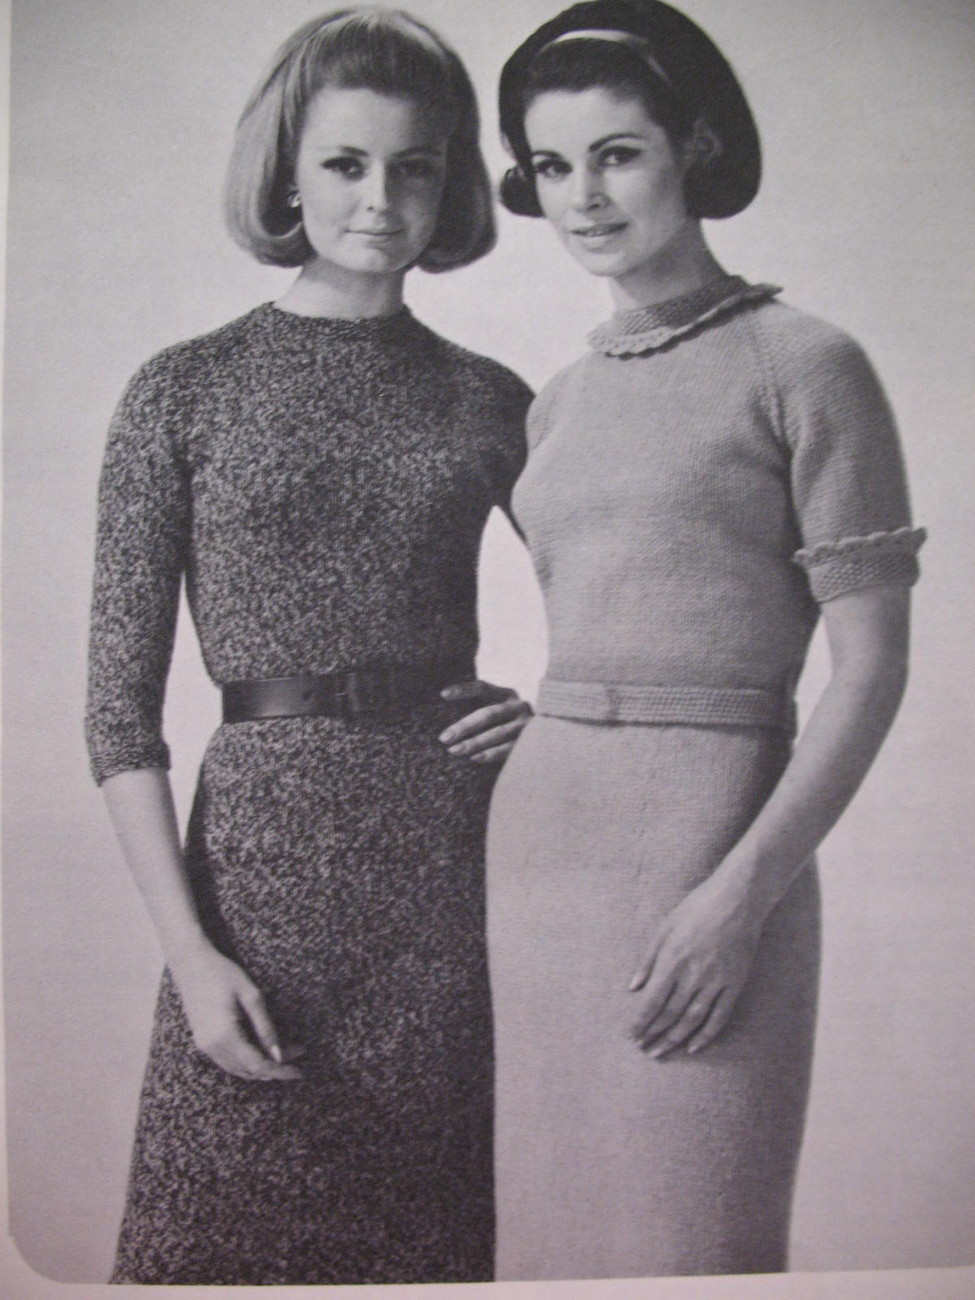 Vintage Patons Raglan Knitting Patterns Sweaters Dresses image 2